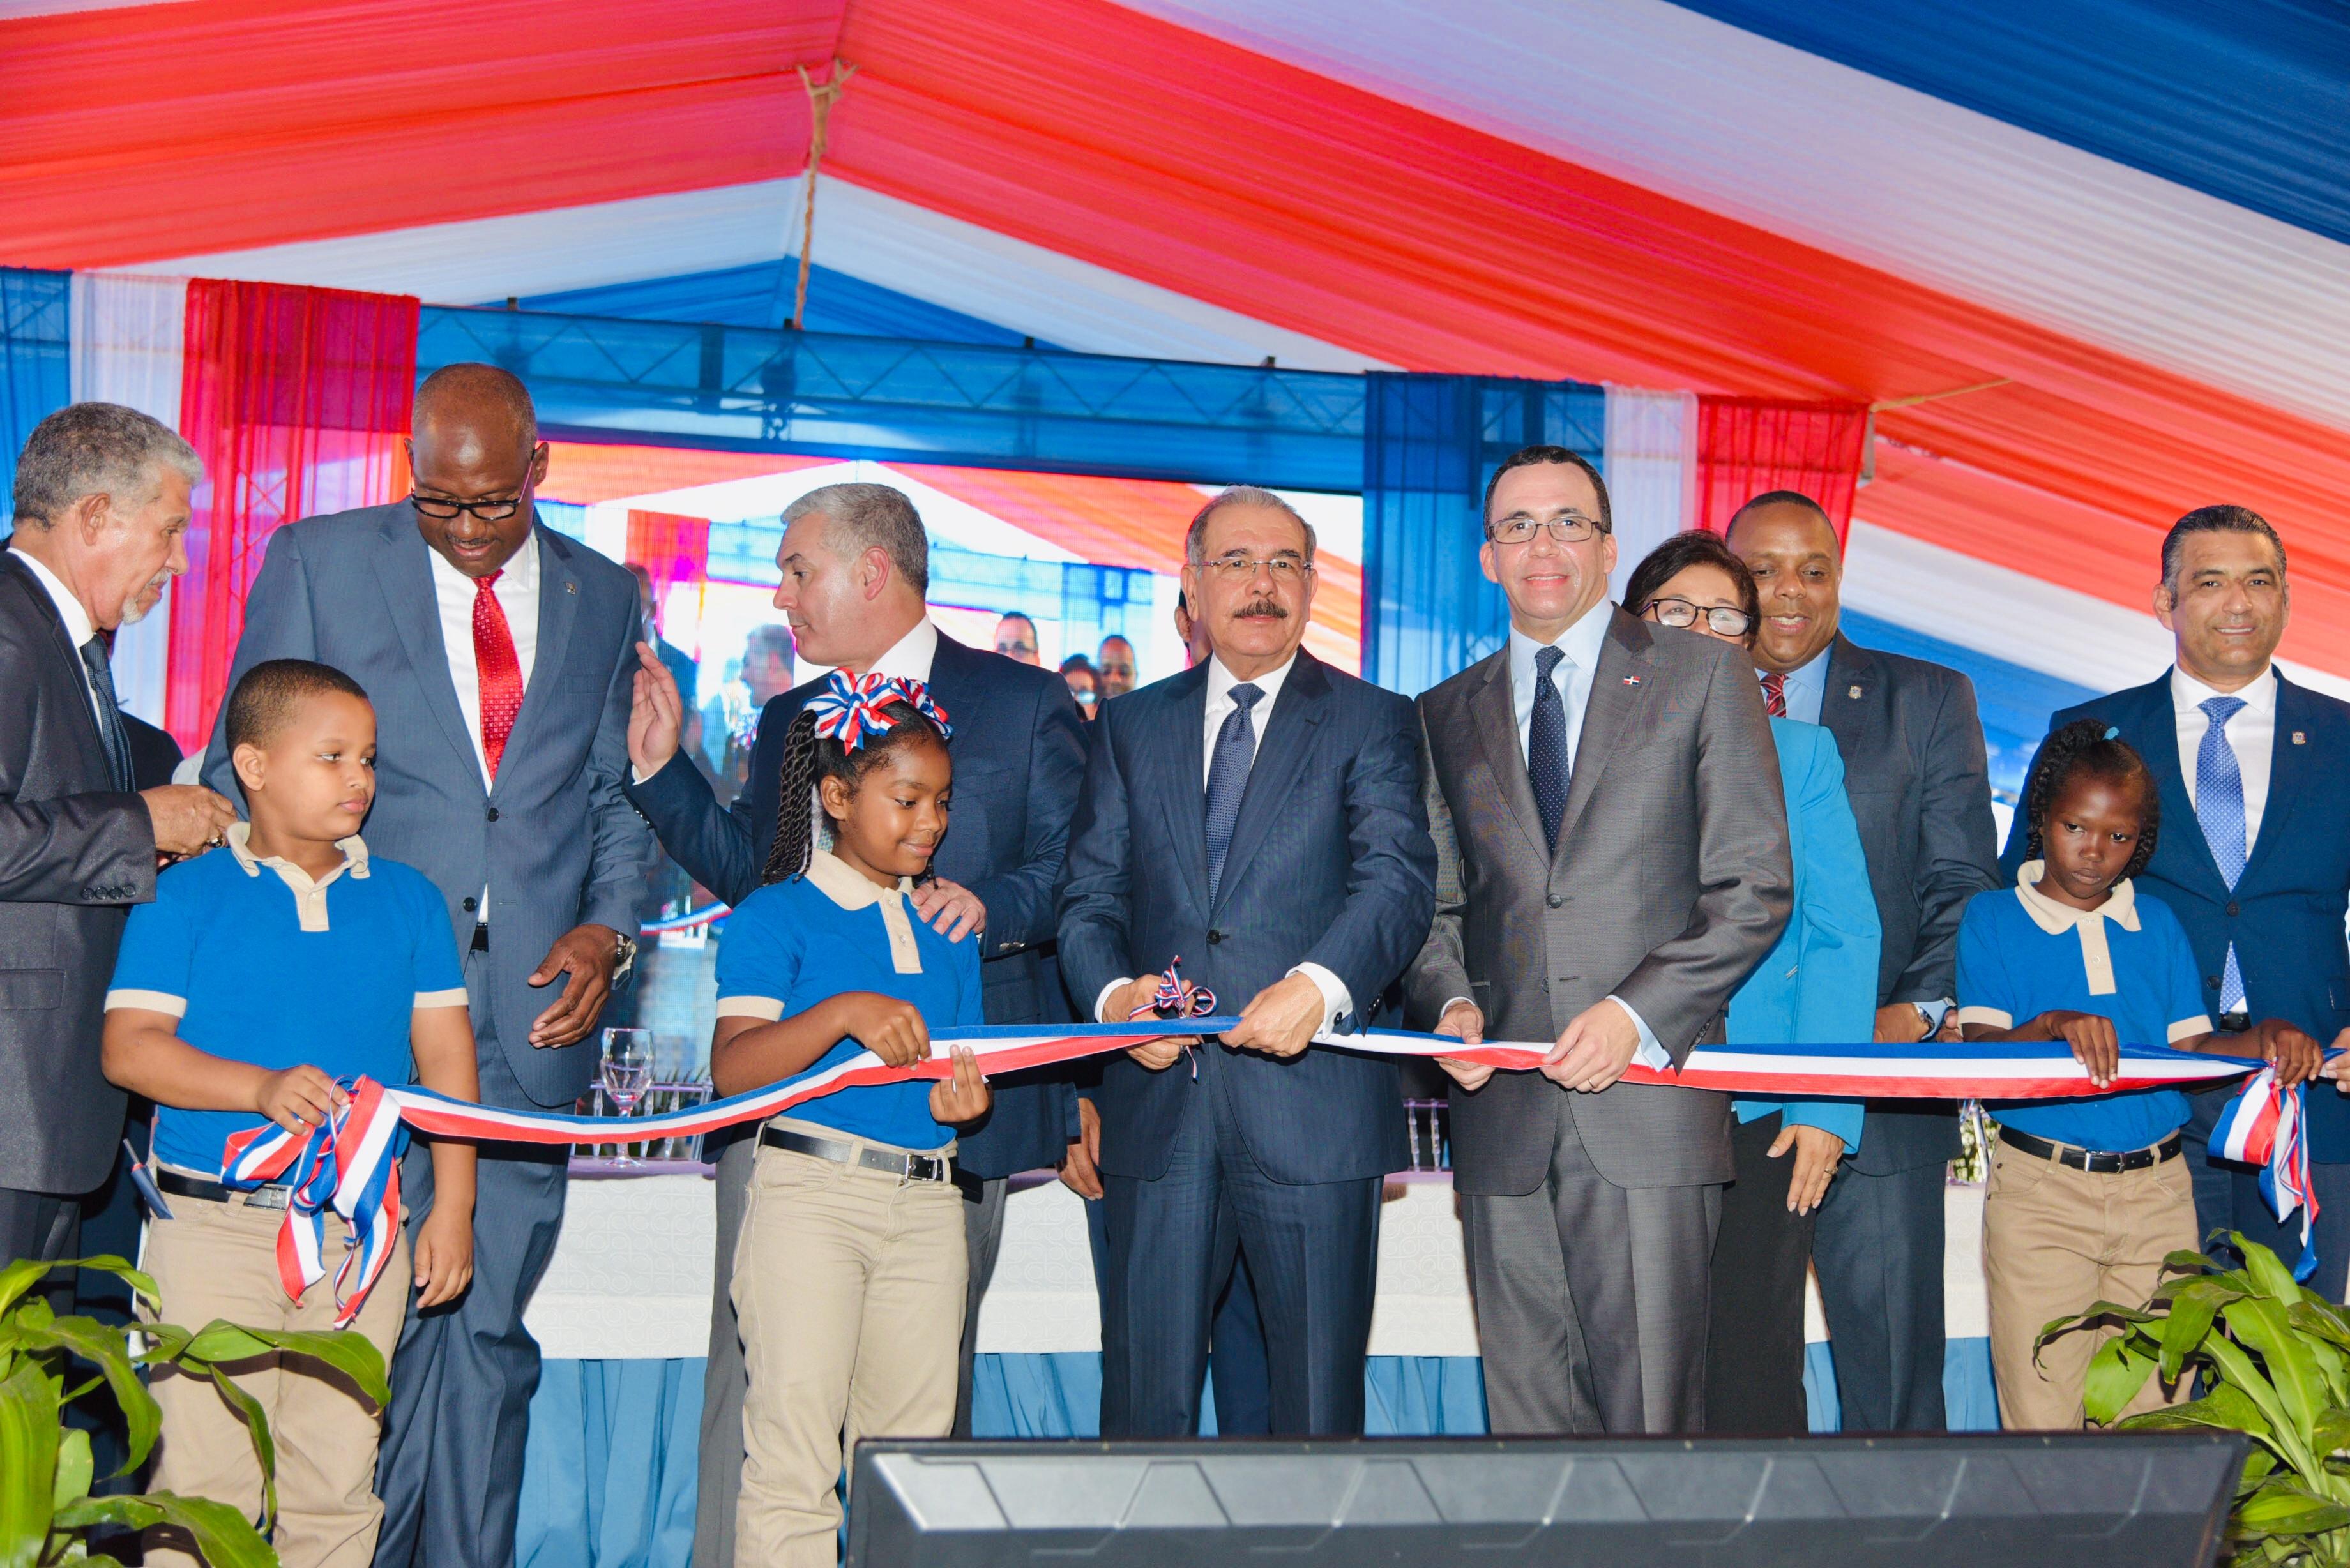 Presidente Medina inaugura escuela en Santo Domingo Este